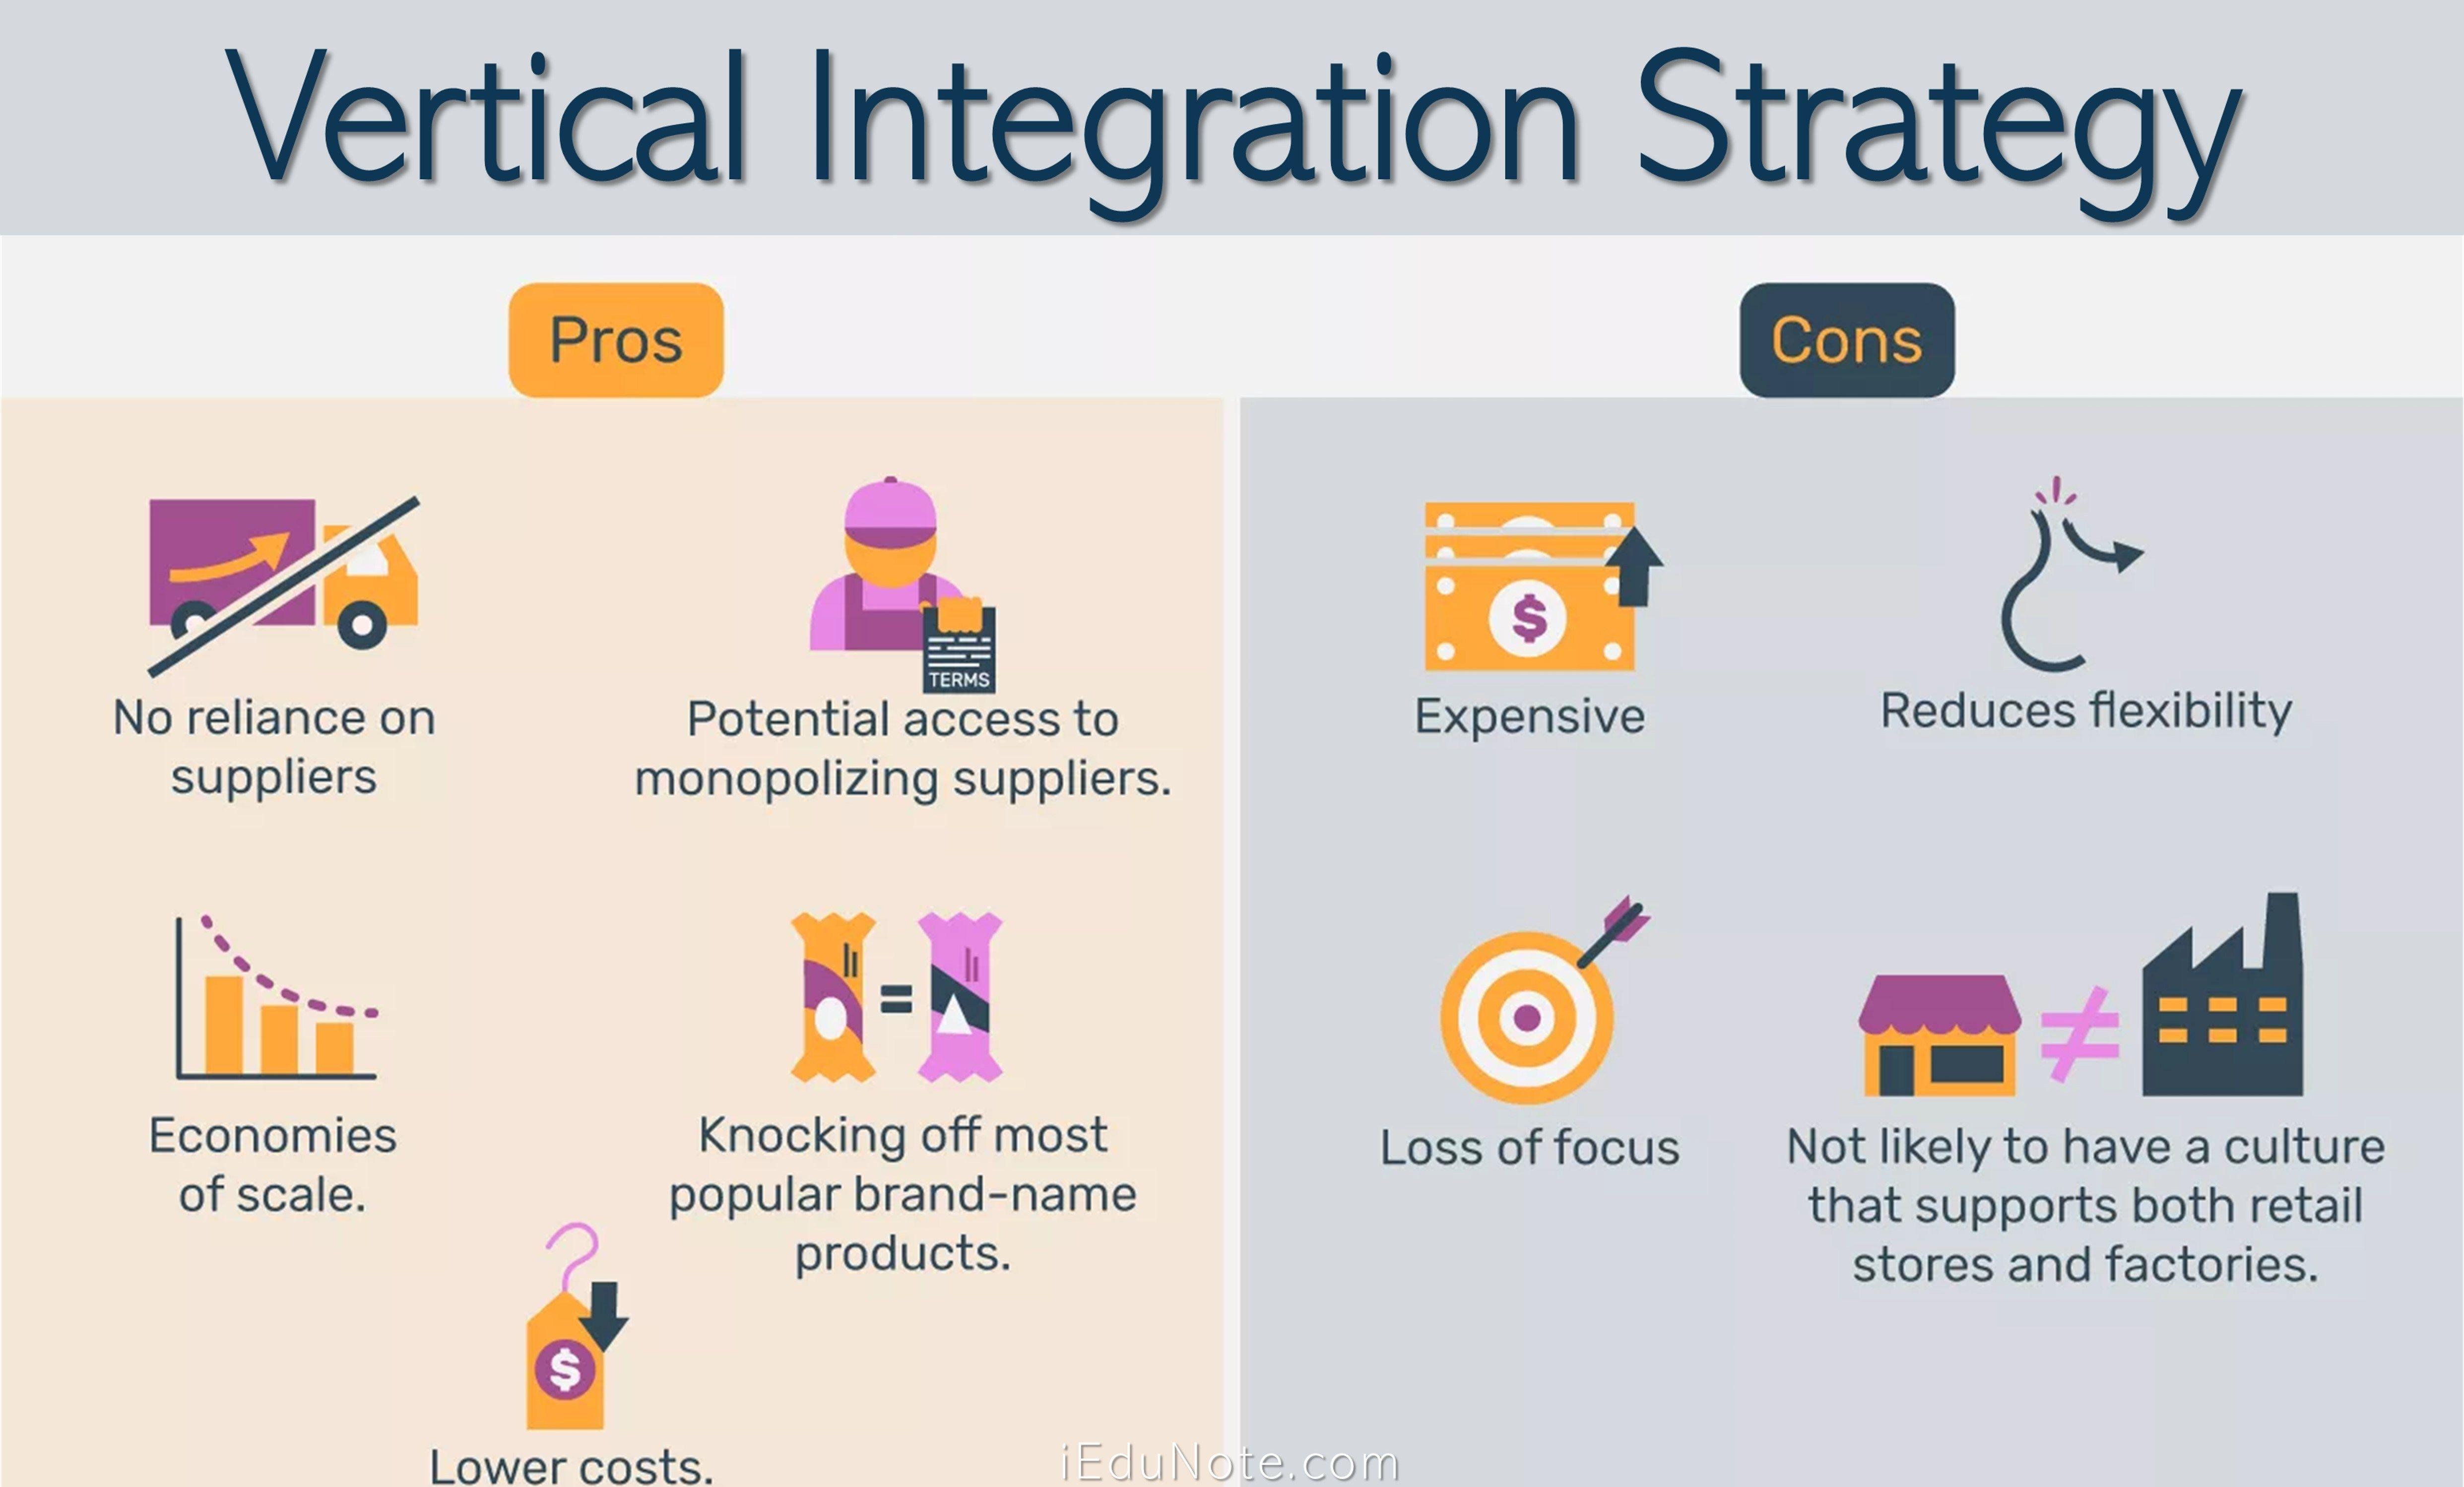 Vertical Integration Strategy Definition Advantages Disadvantages Vertical Integration Horizontal Integration Business Risk